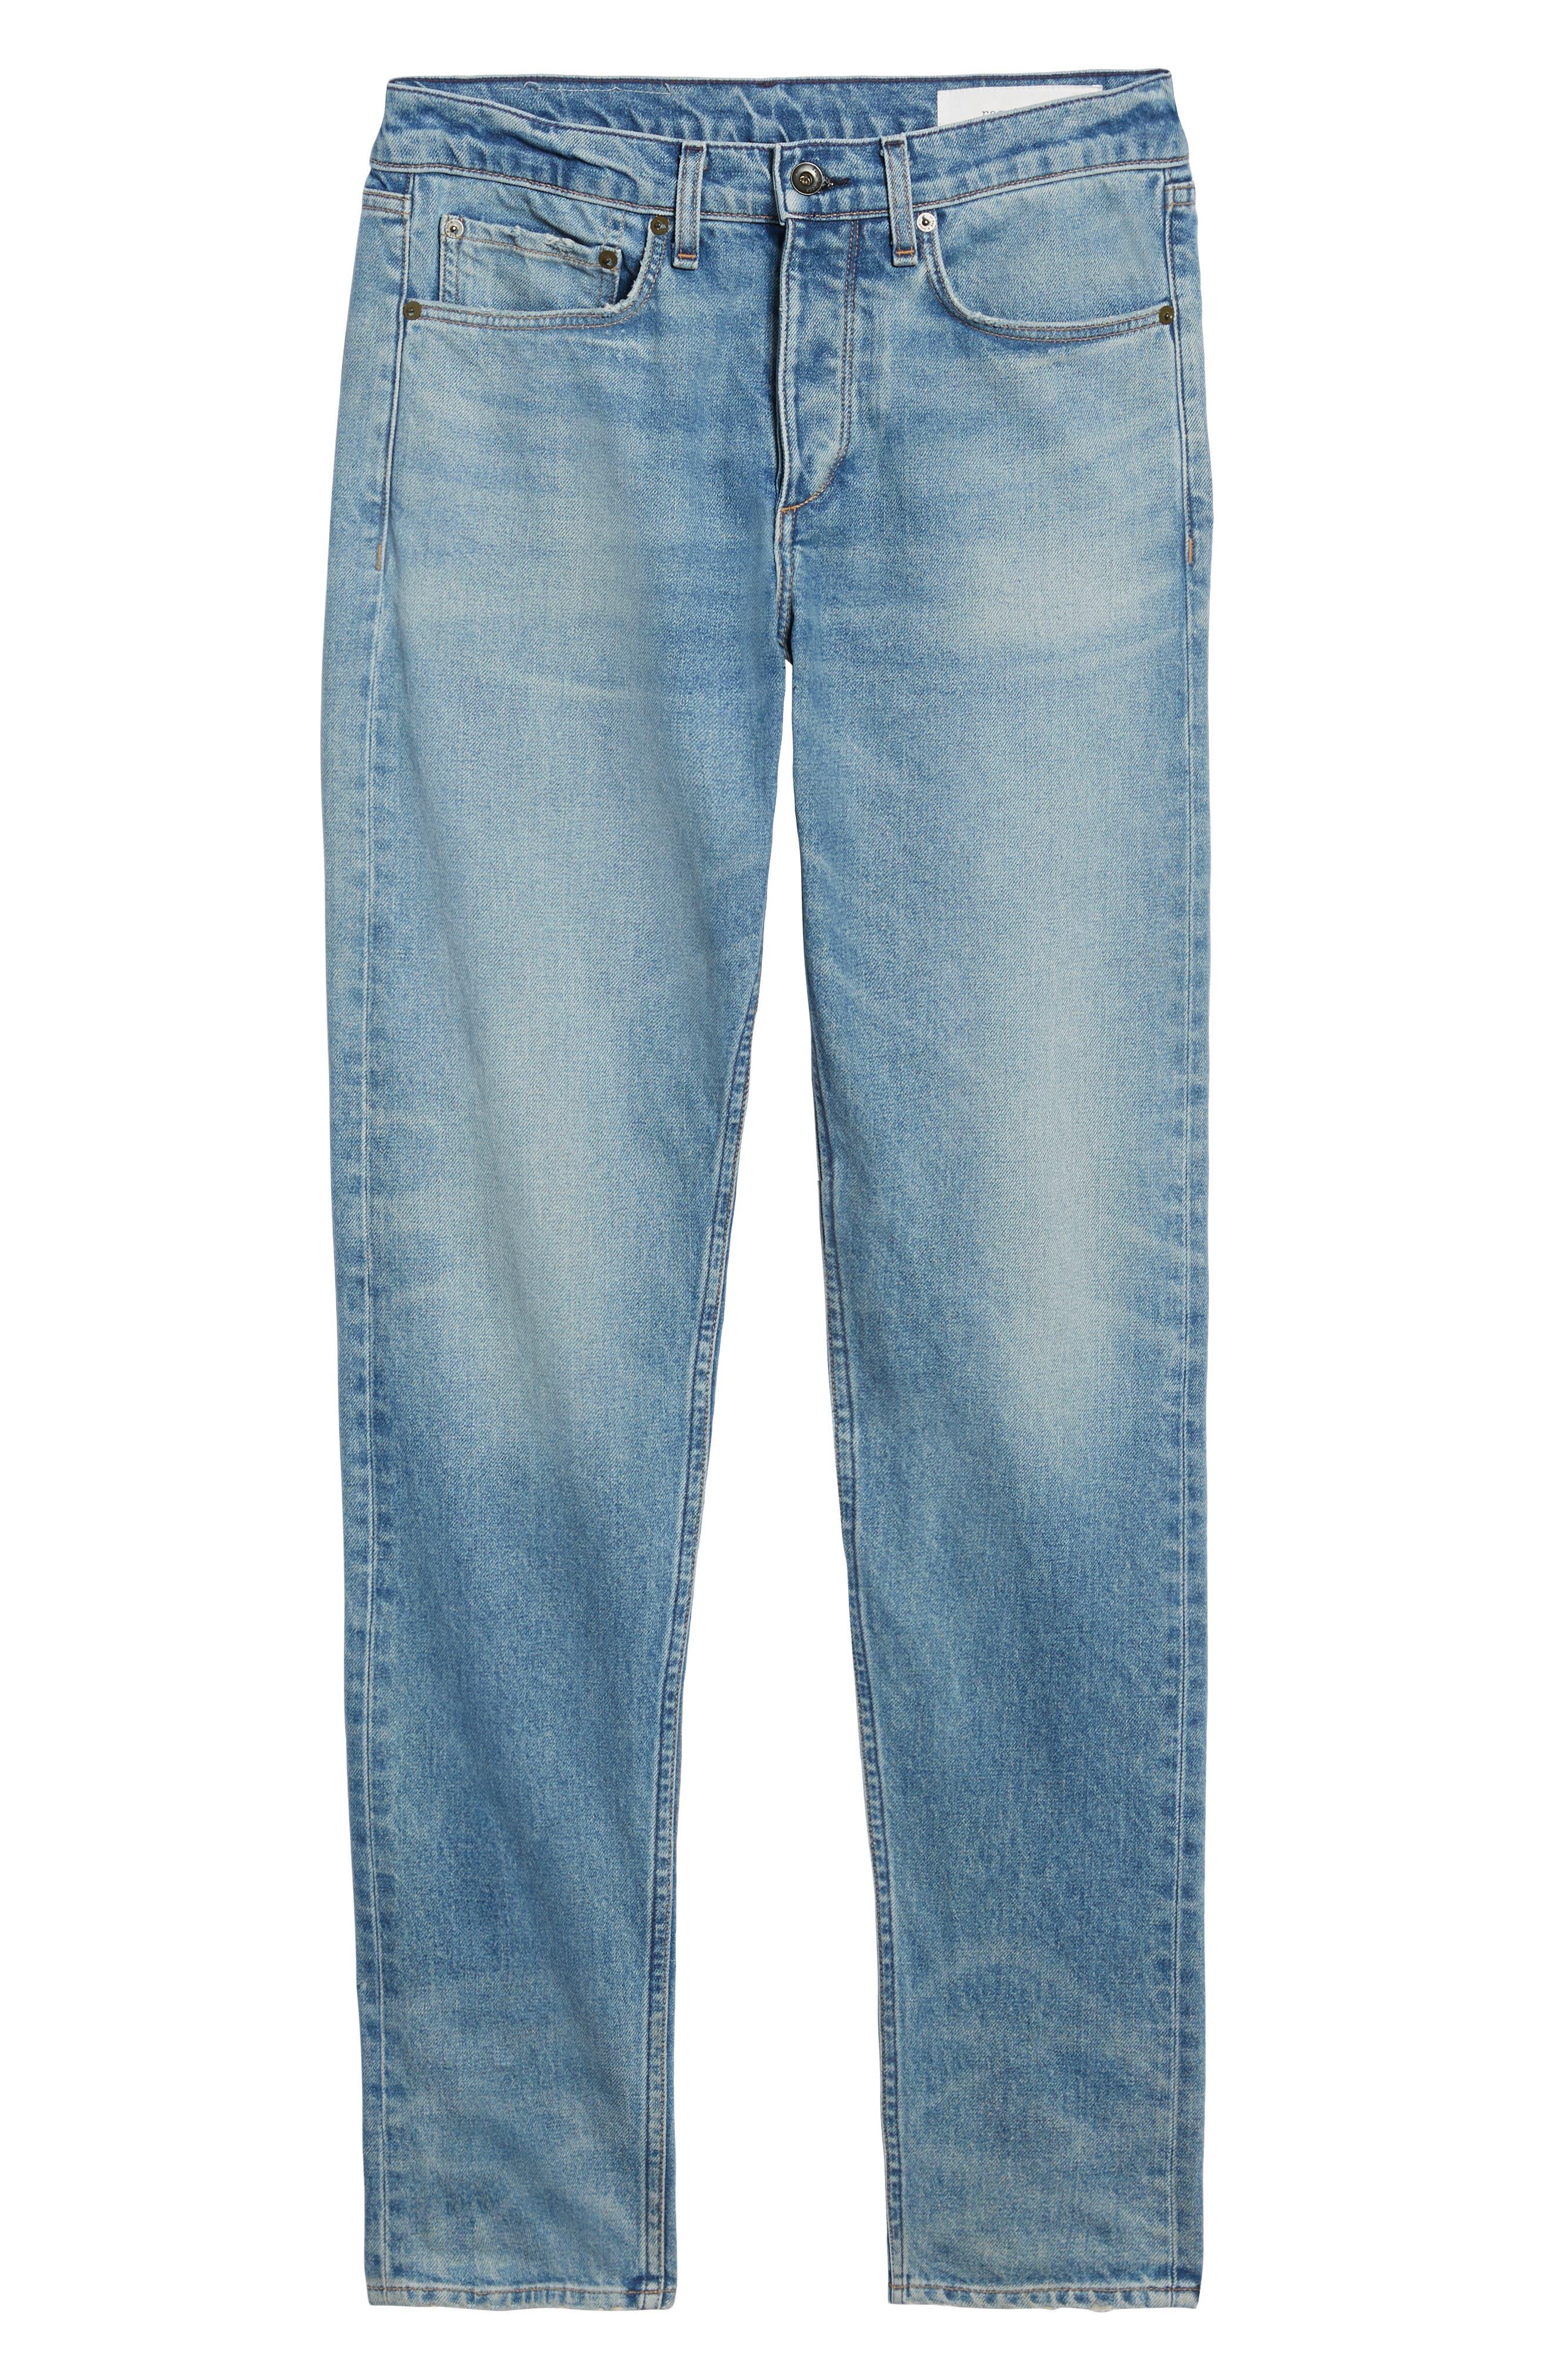 Fit 1 Skinny Fit Jeans,                             Alternate thumbnail 6, color,                             JAMIE